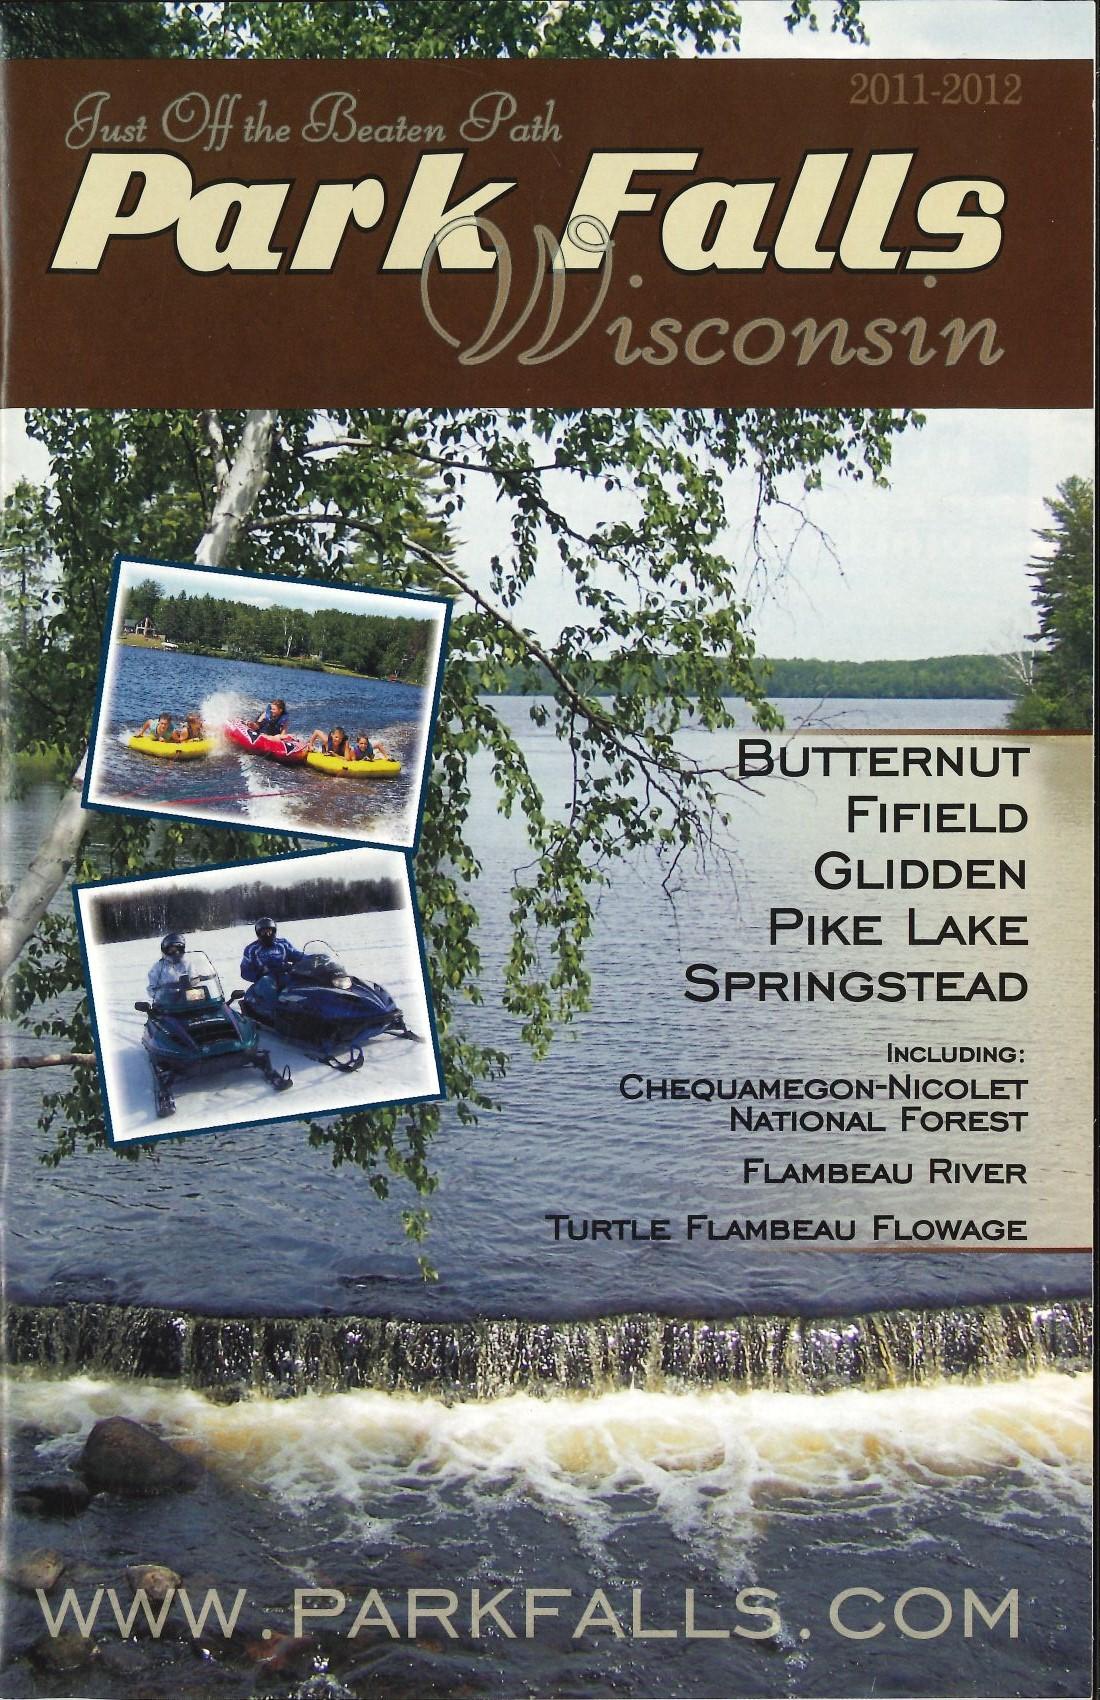 Park Falls 2011-12 Guide